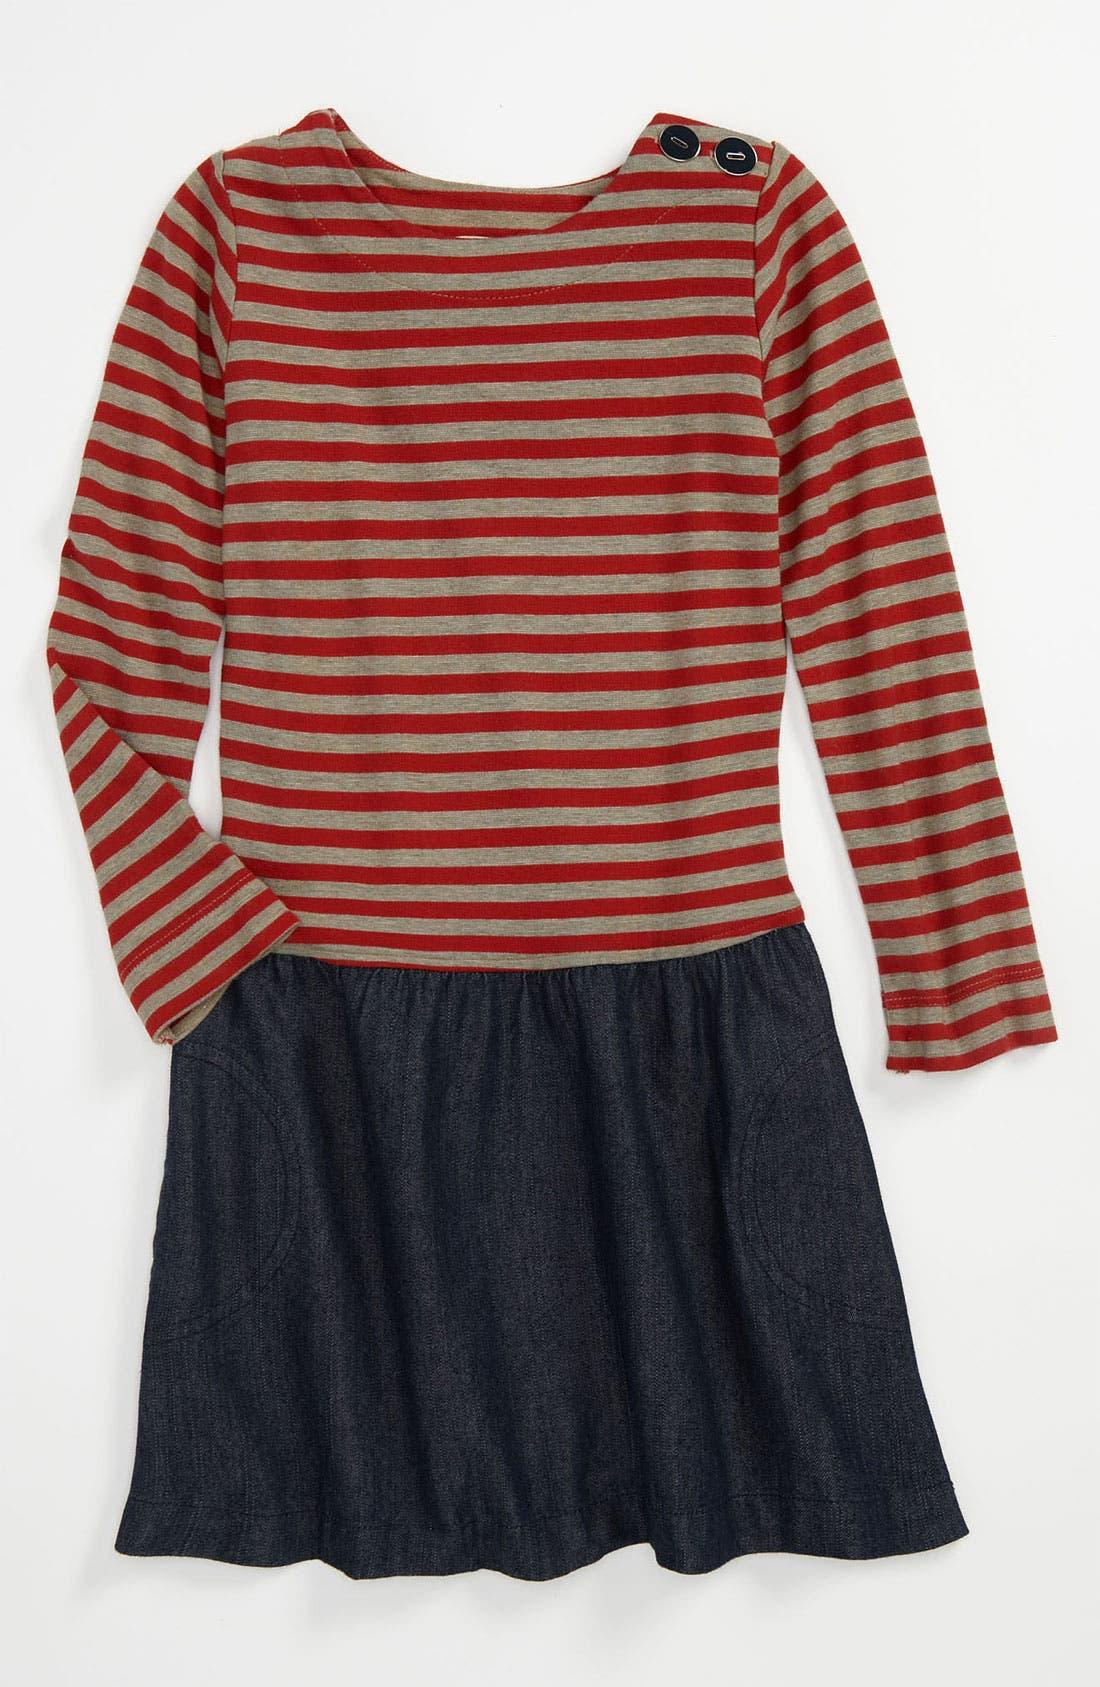 Main Image - Anthem of the Ants 'Museum' Stripe Dress (Little Girls & Big Girls)